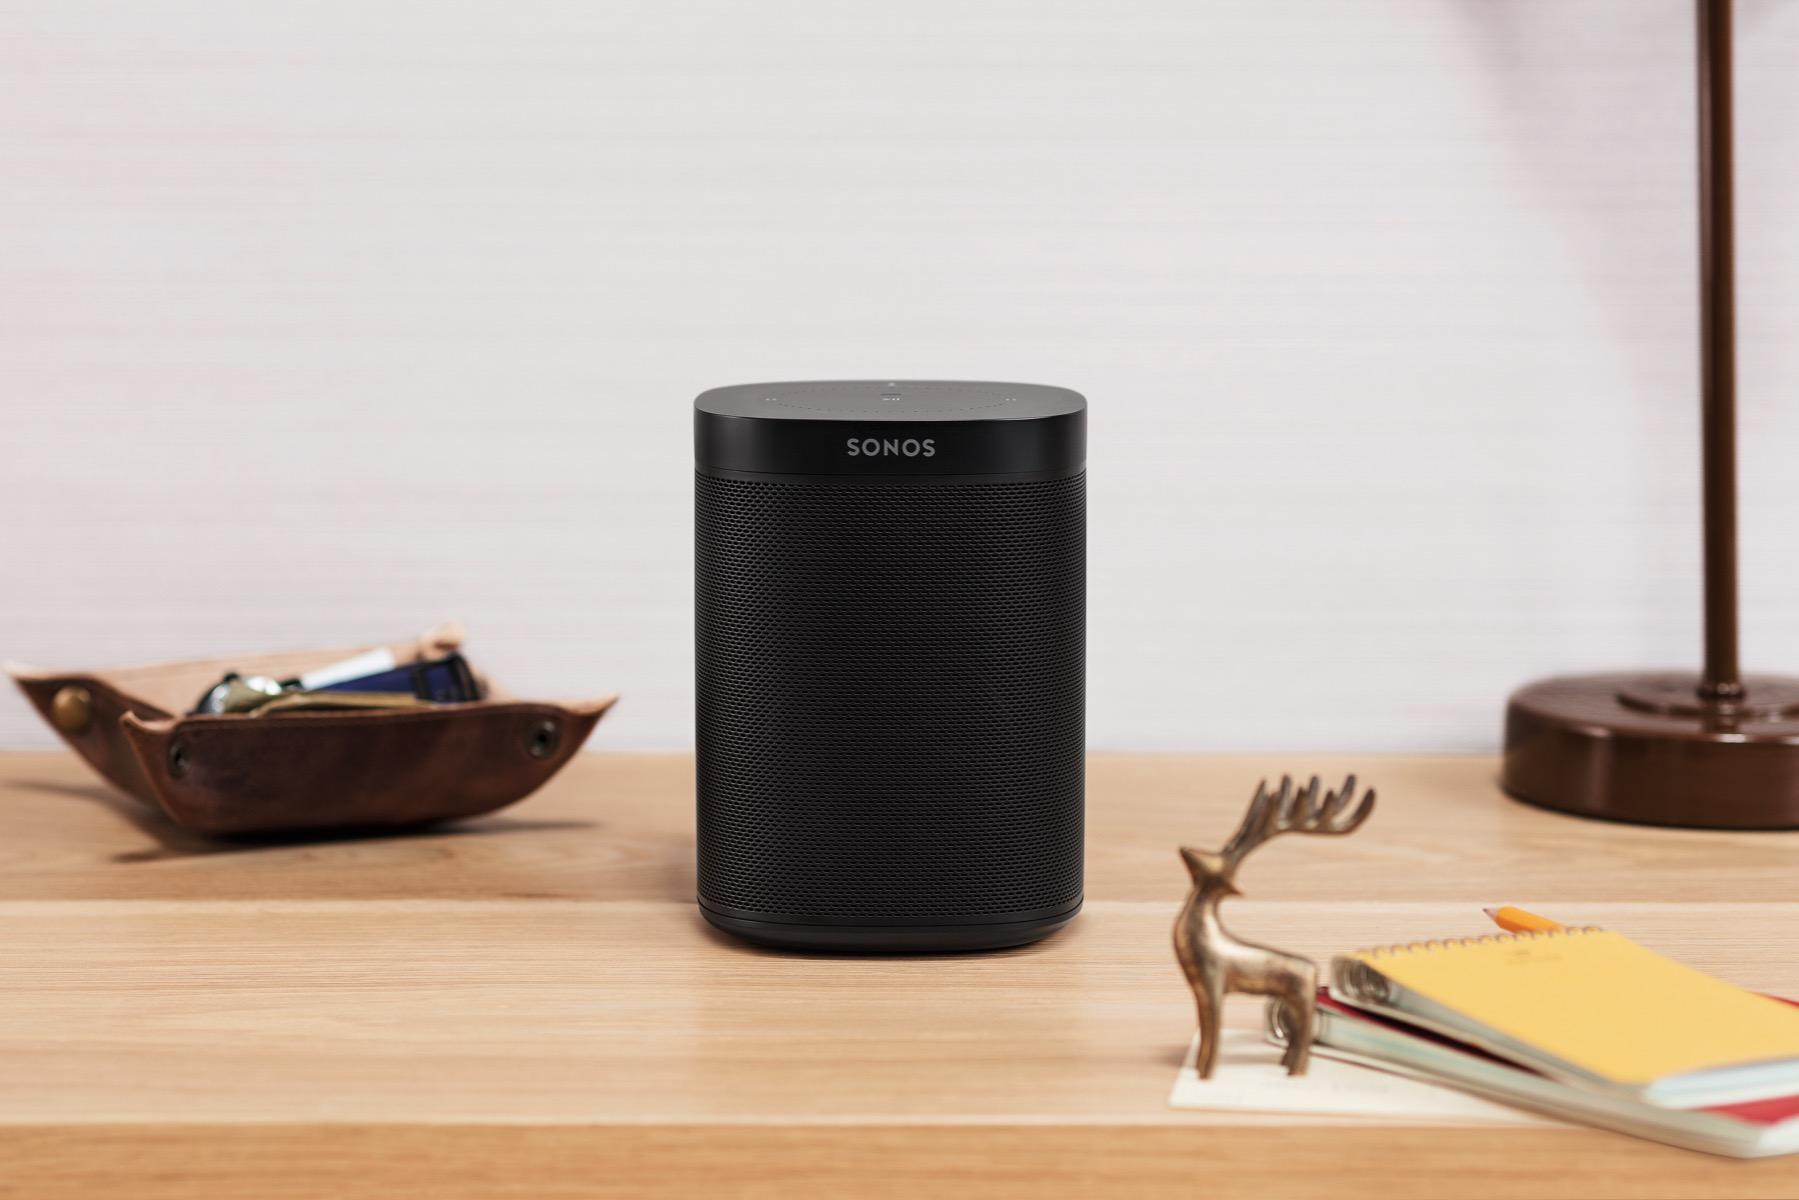 Sonos-one-lifestlye